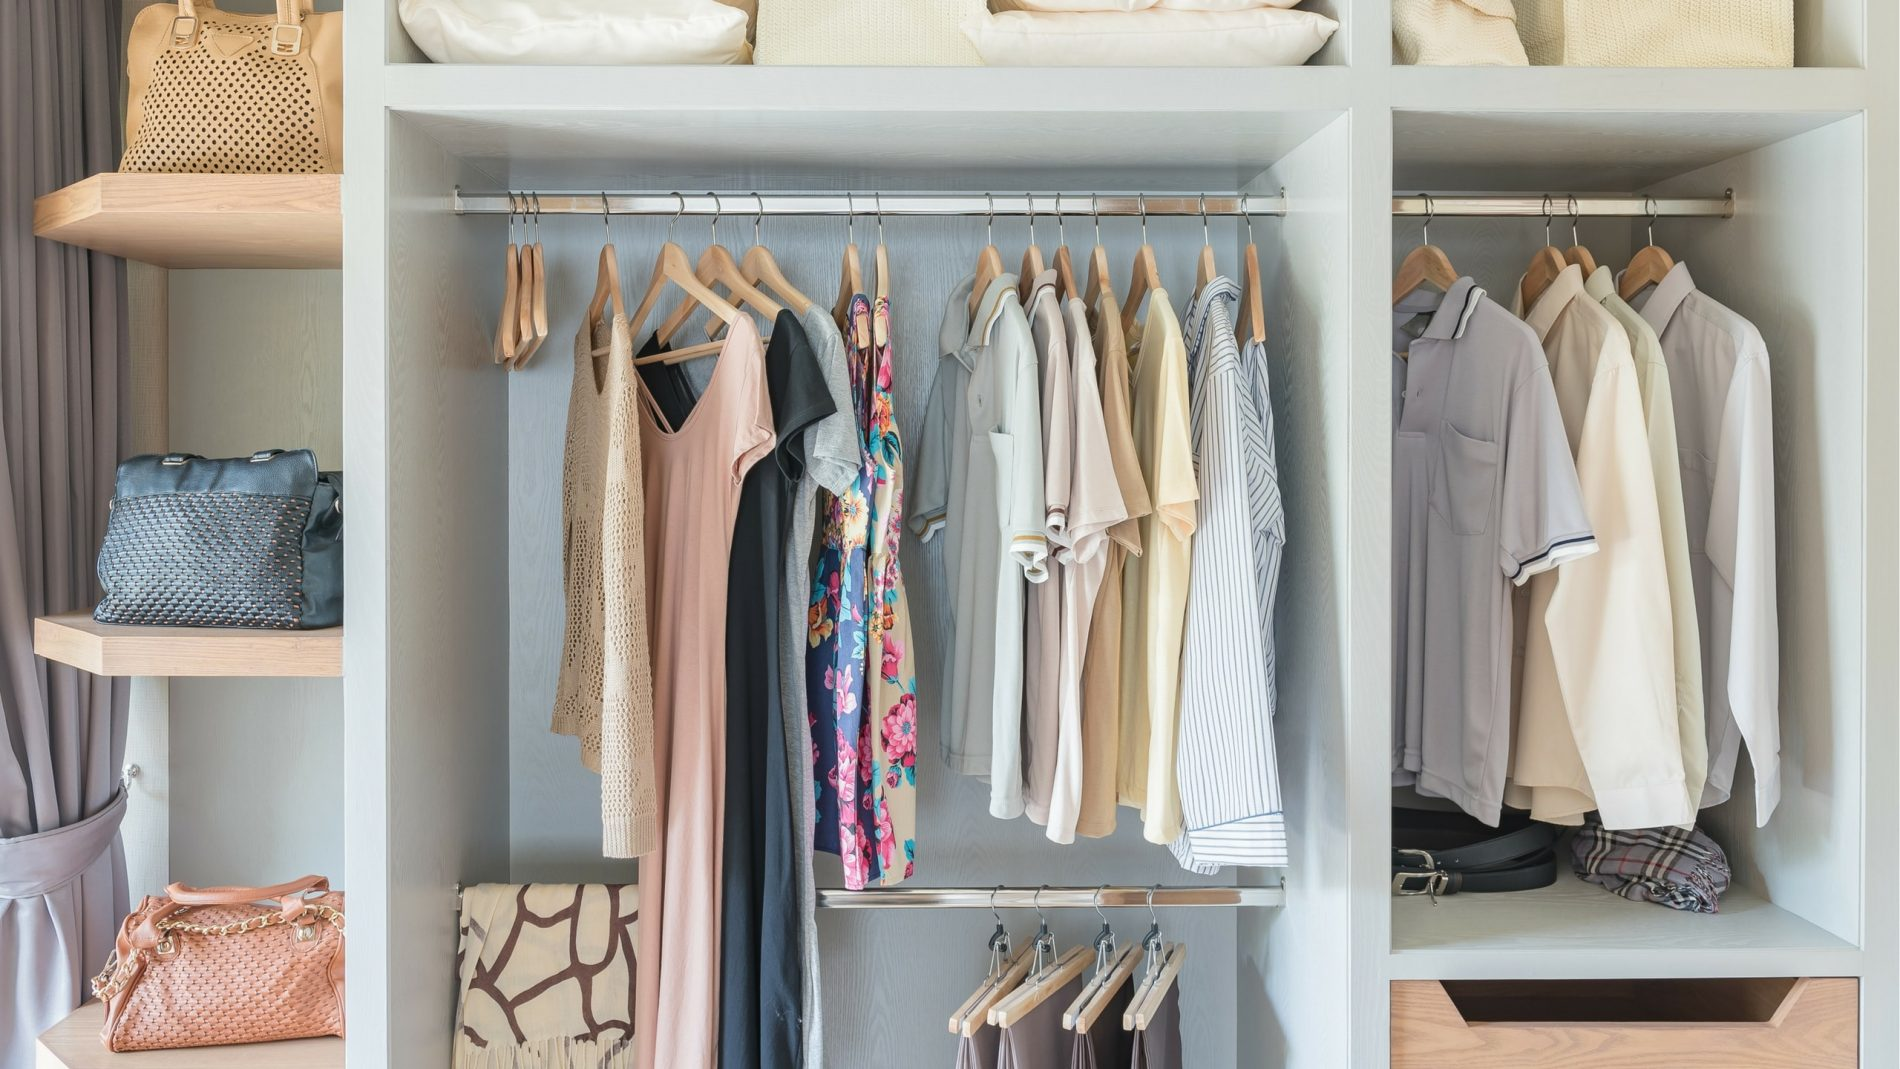 9 Closet Organization Hacks That Are Brilliantly Easy